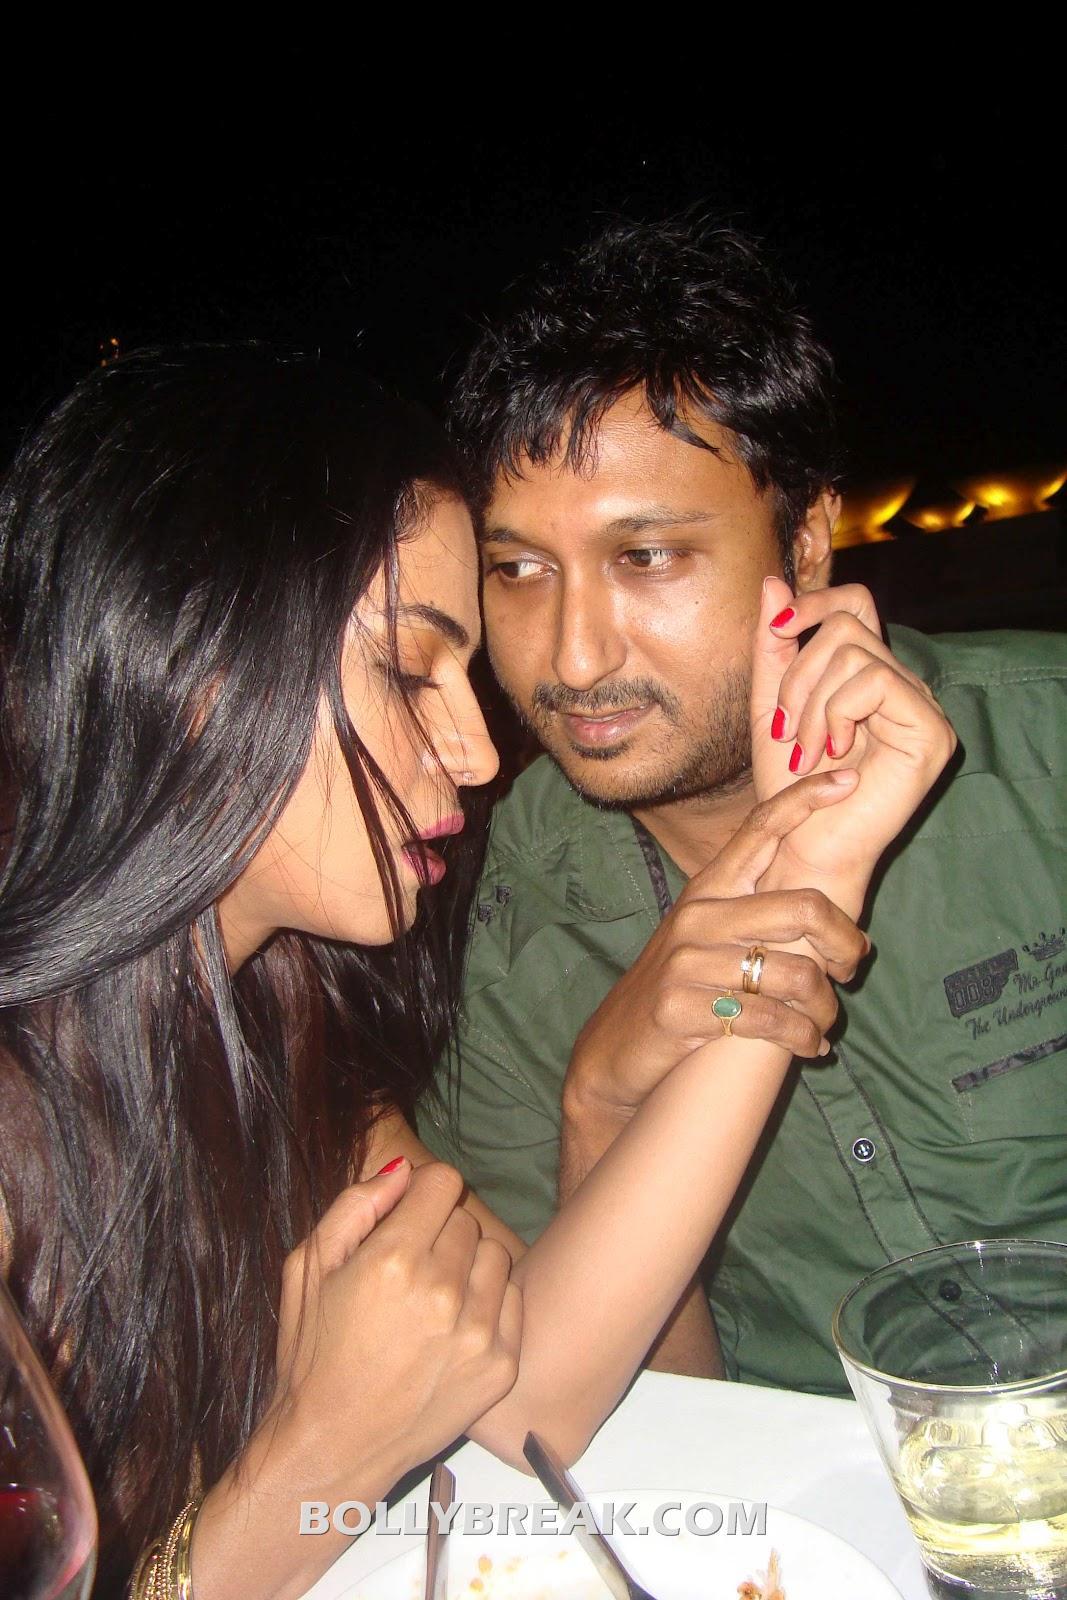 Veena Malik Hemant Madhukar  -  Veena Malik Hemant Madhukar Leaked Private Pics